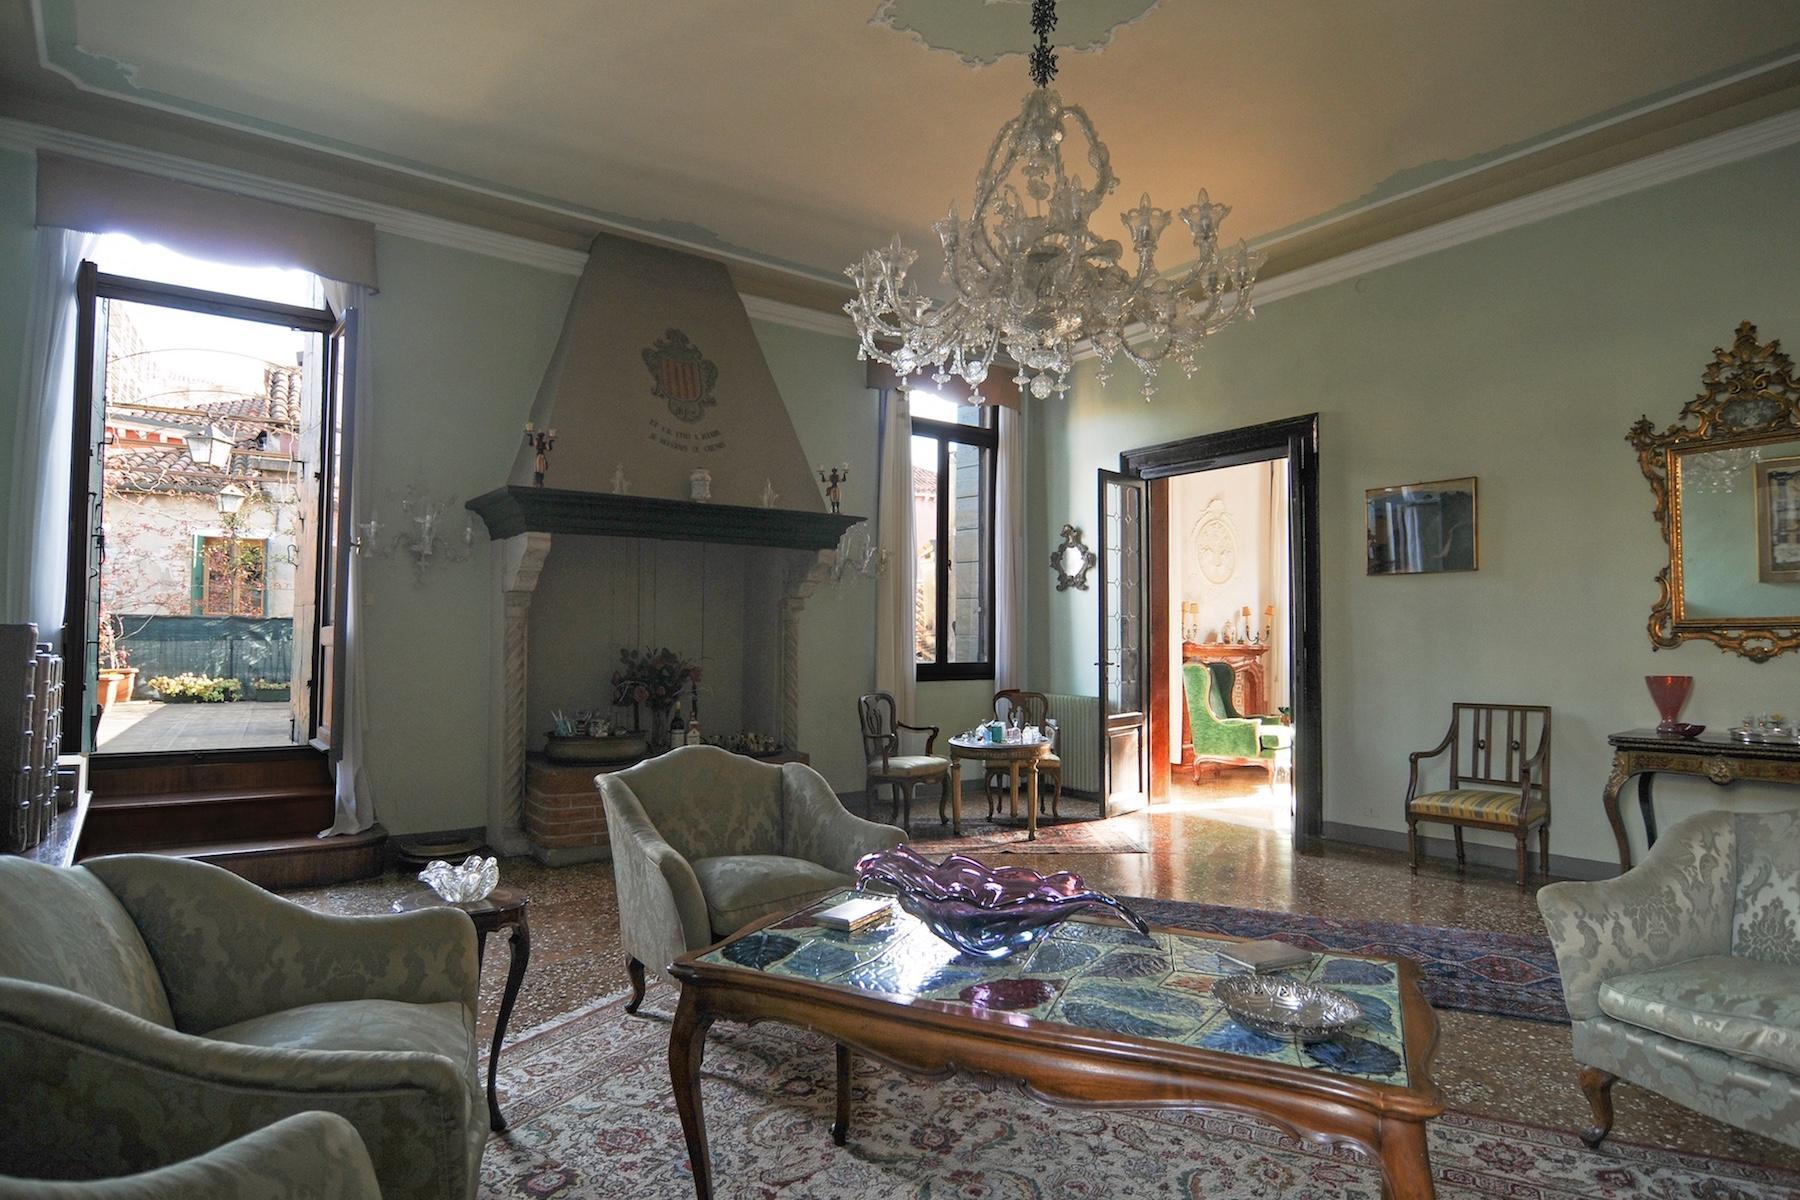 Elegante Piano Nobile con terrazzo a San Giacomo dell'Orio - 2